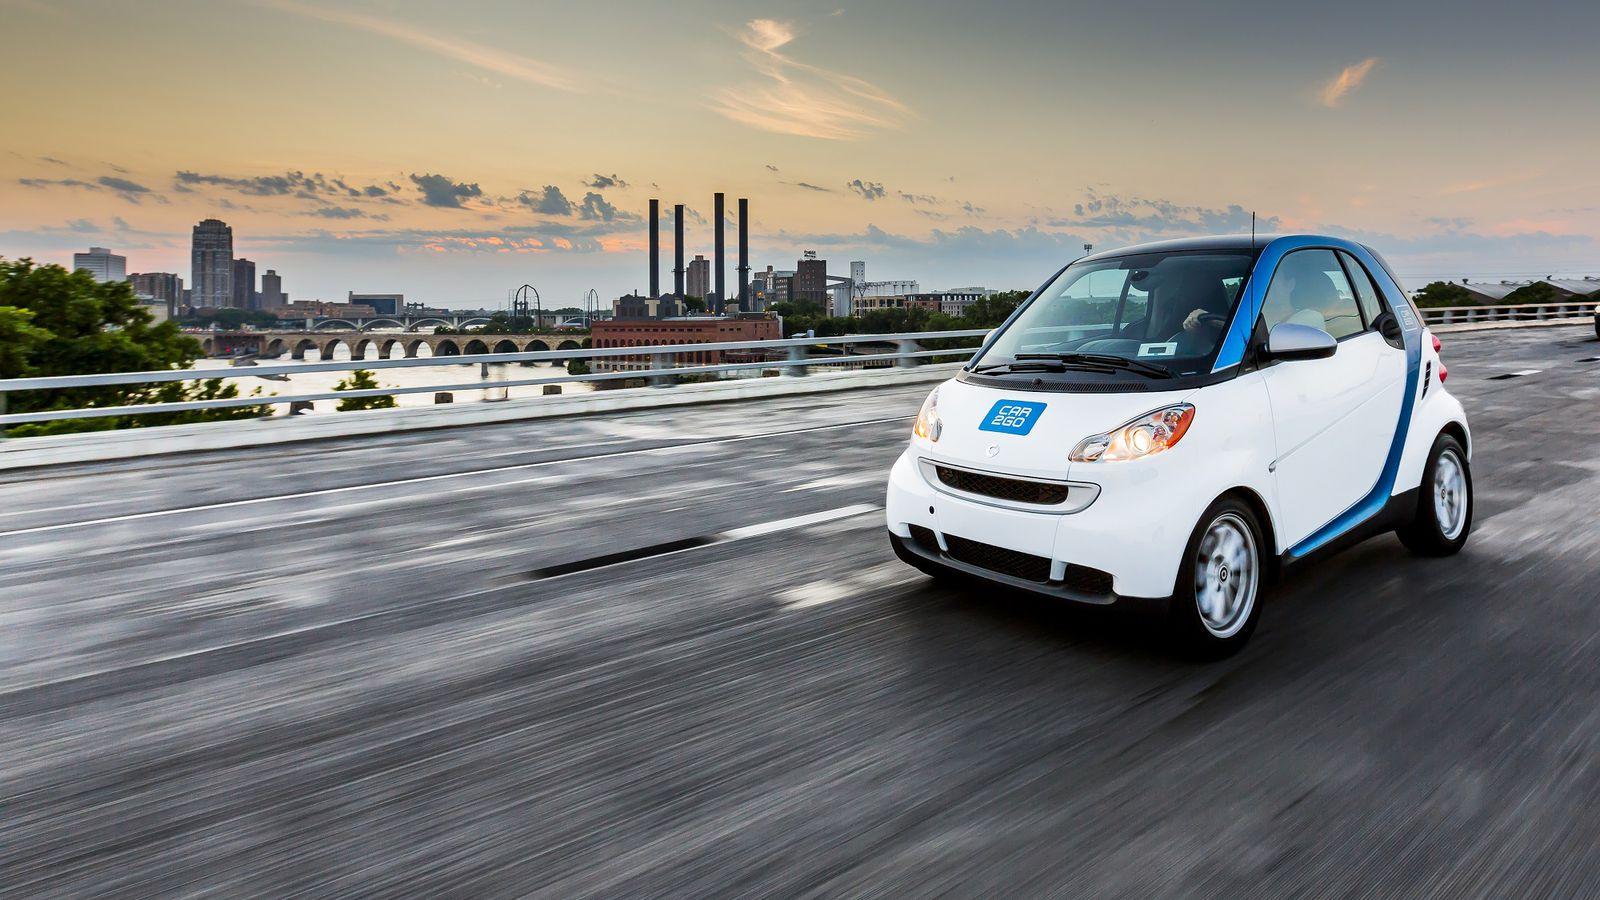 Hyundai Kona debutta con un interessante concorso - image car2go-1 on http://auto.motori.net